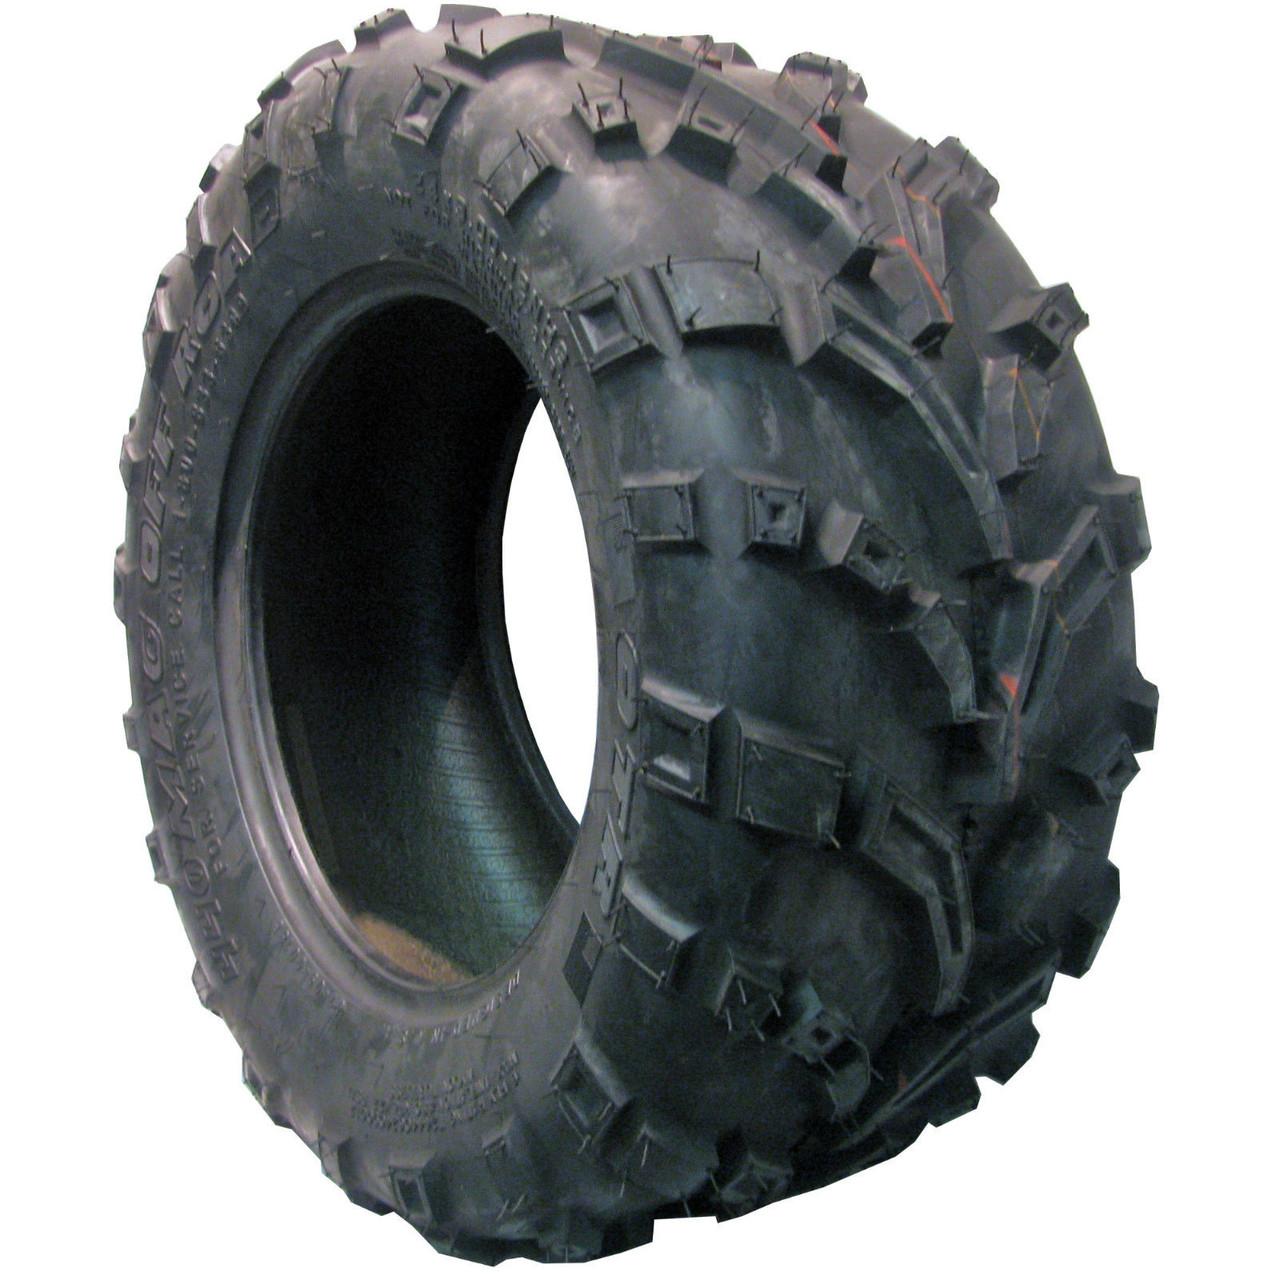 New Tire 25 9.00 12 OTR 440 Mag 6 Ply ATV 25x9.00-12 25x9-12